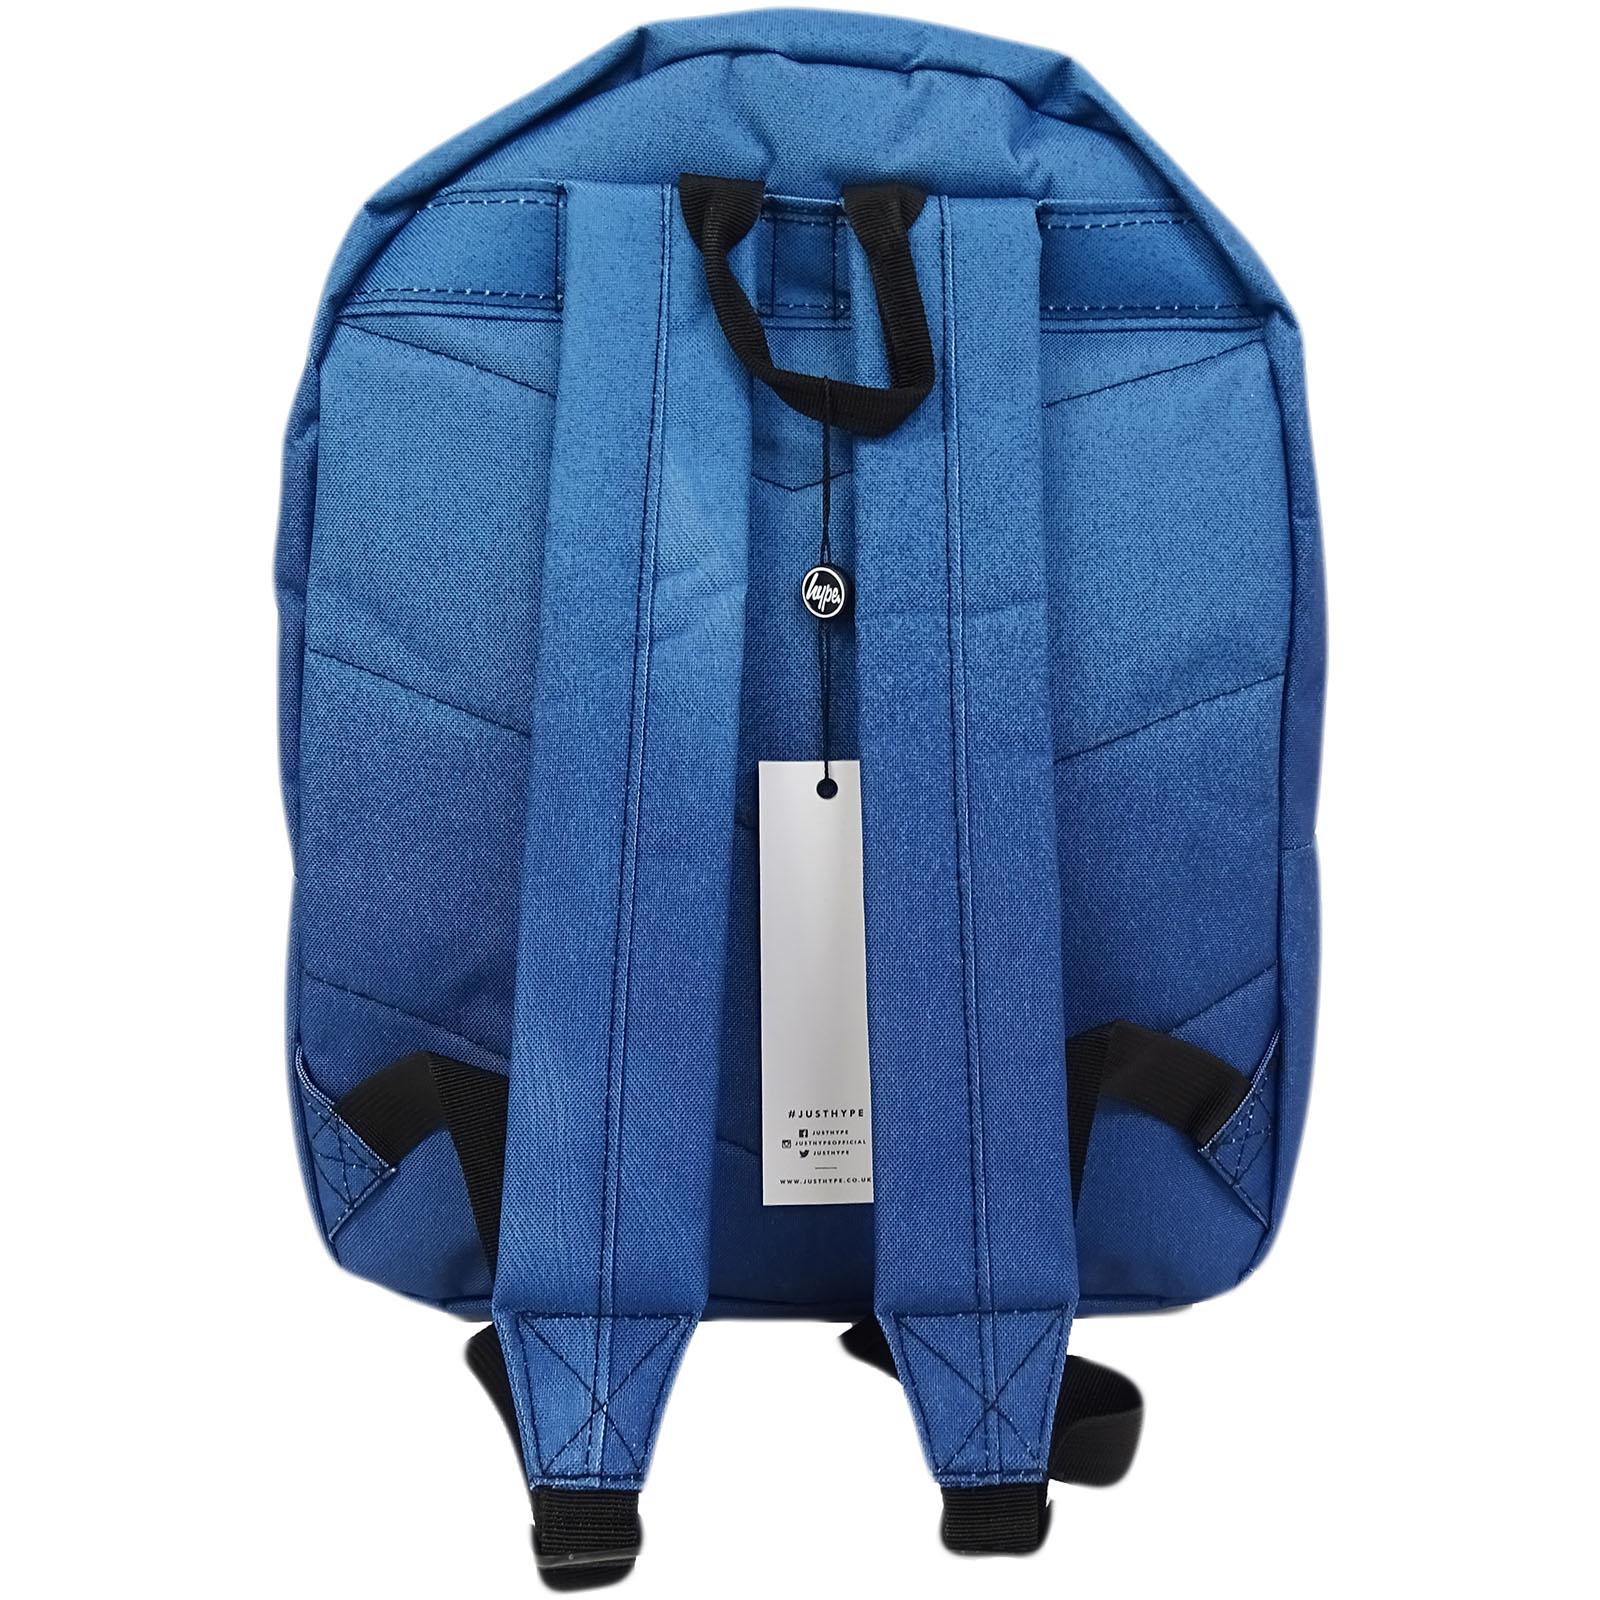 Unisexe-Hype-Sac-A-Dos-Ecole-Gym-SACS-pochettes-pencil-case miniature 114